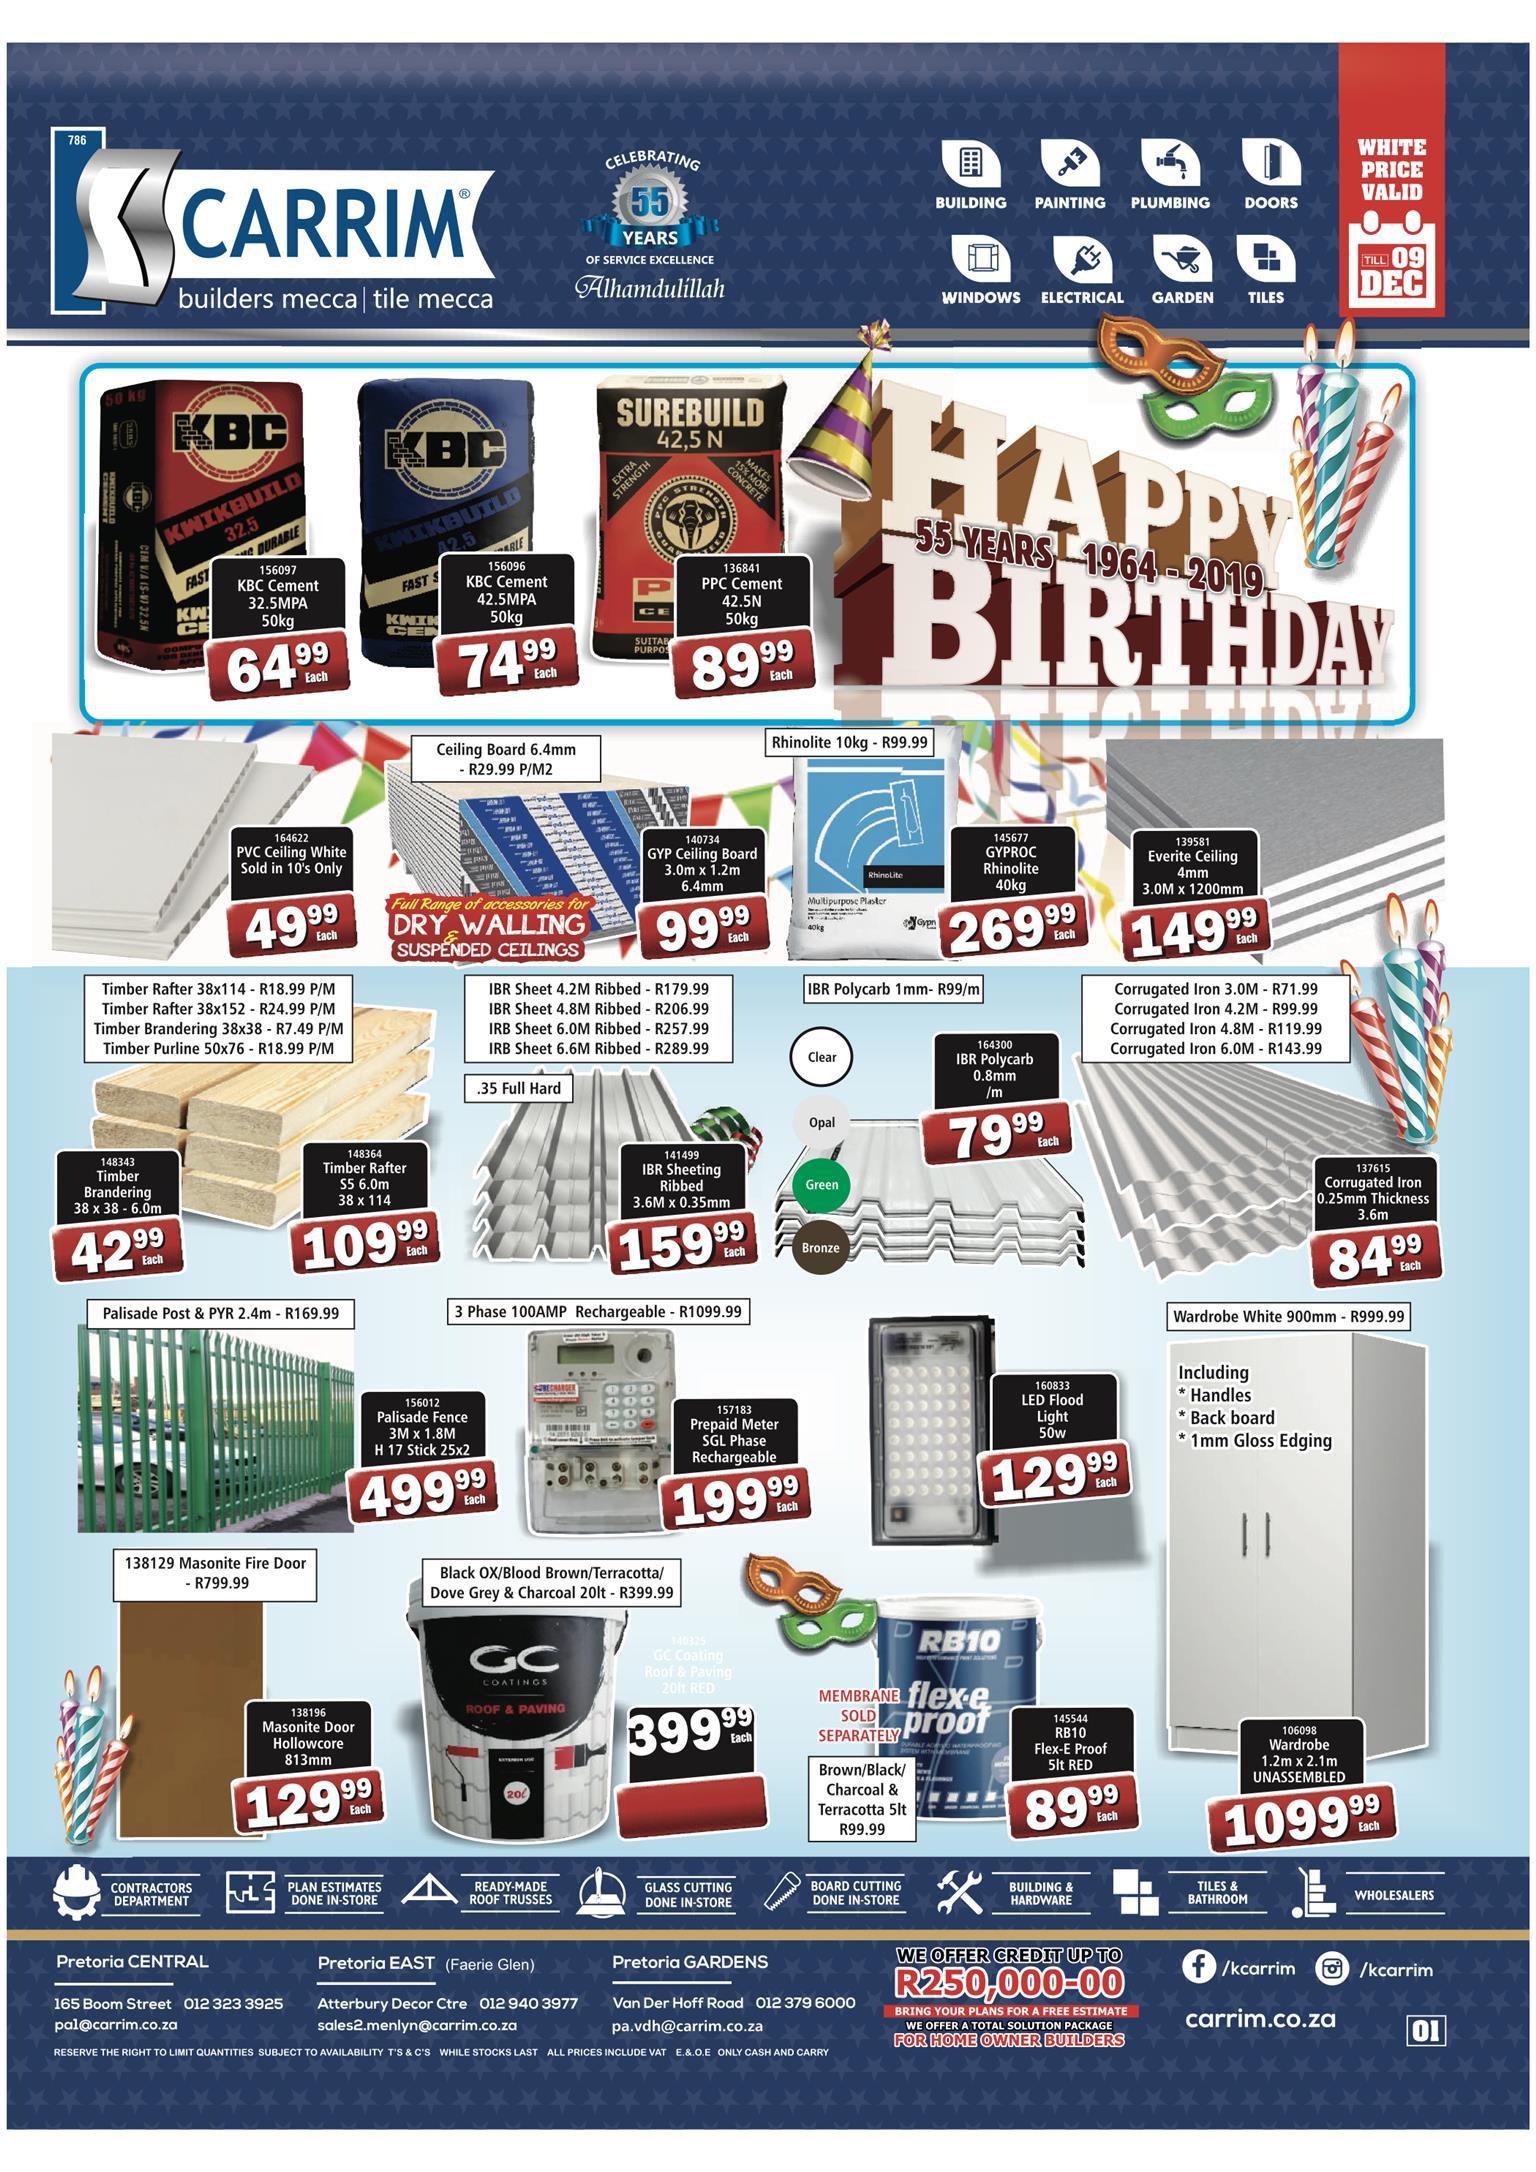 K CARRIM : Birthday Special